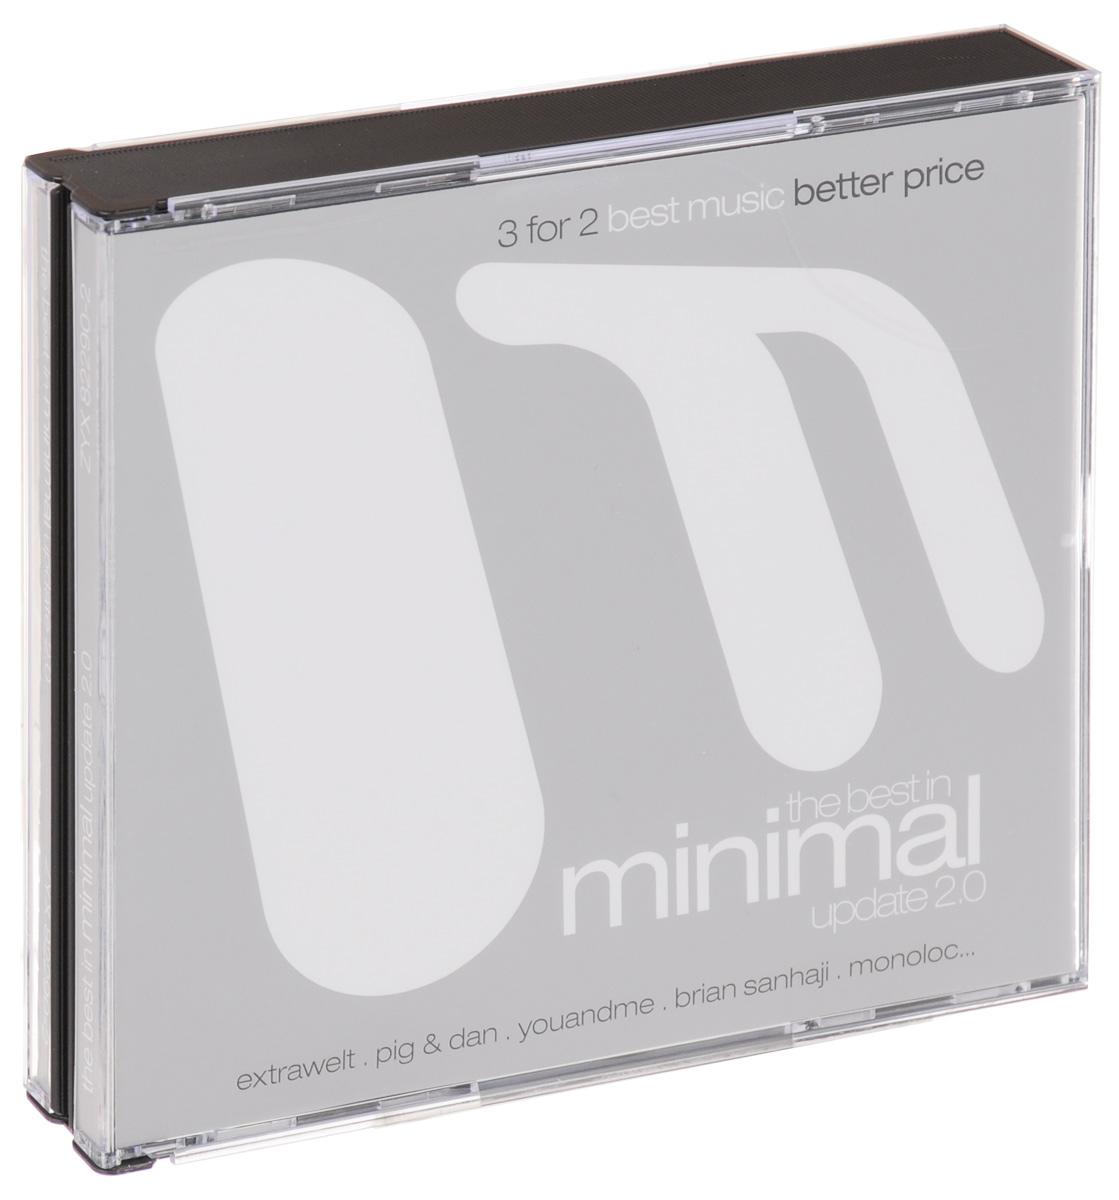 The Best In Minimal Update 2.0 (3 CD) михаил плетнев филип лейджер роджер норрингтон джон нельсон сабин мейер best adagios 50 3 cd